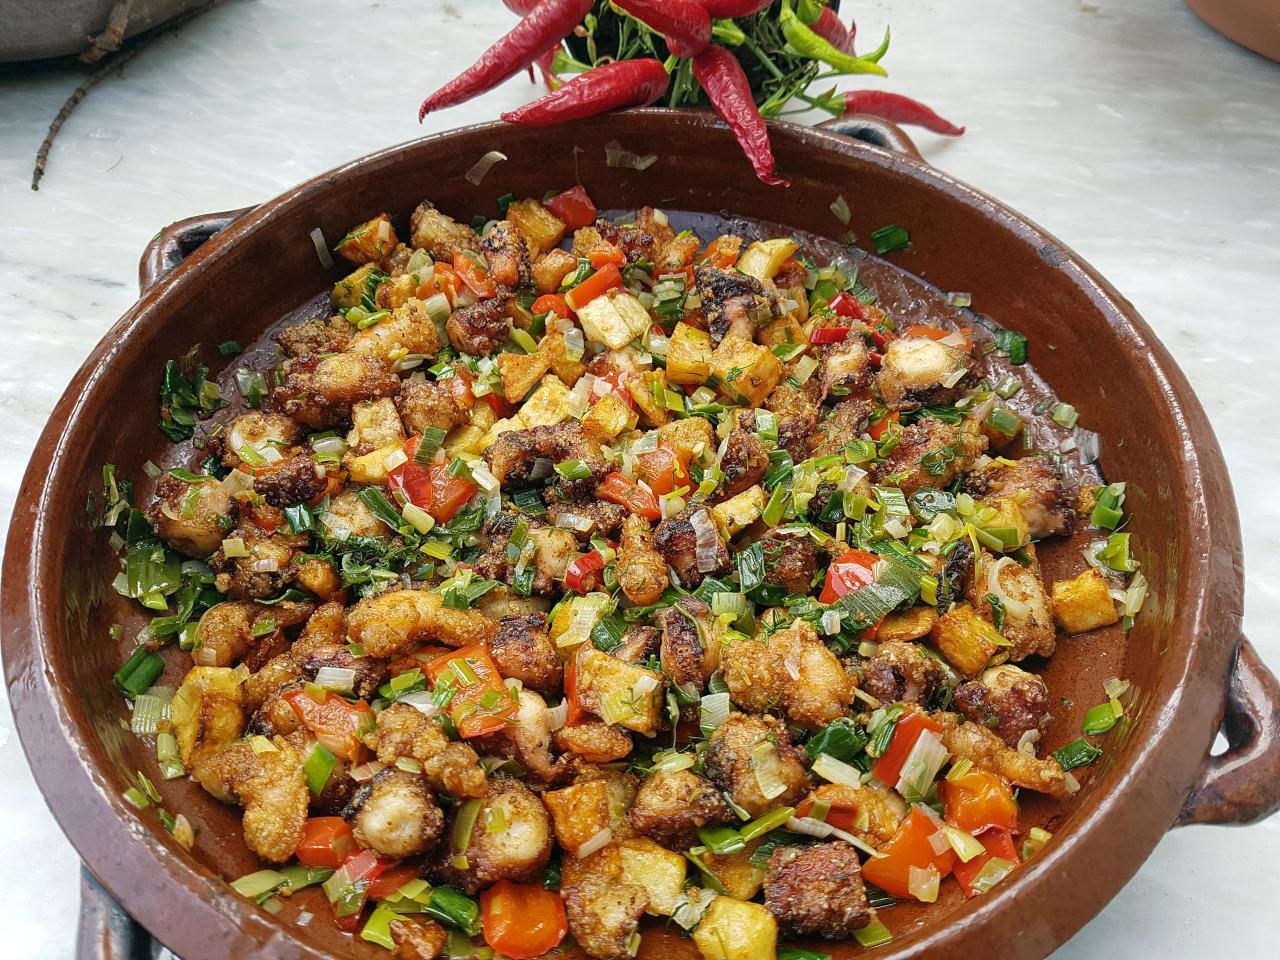 Majorcan dish wich uses sofrito